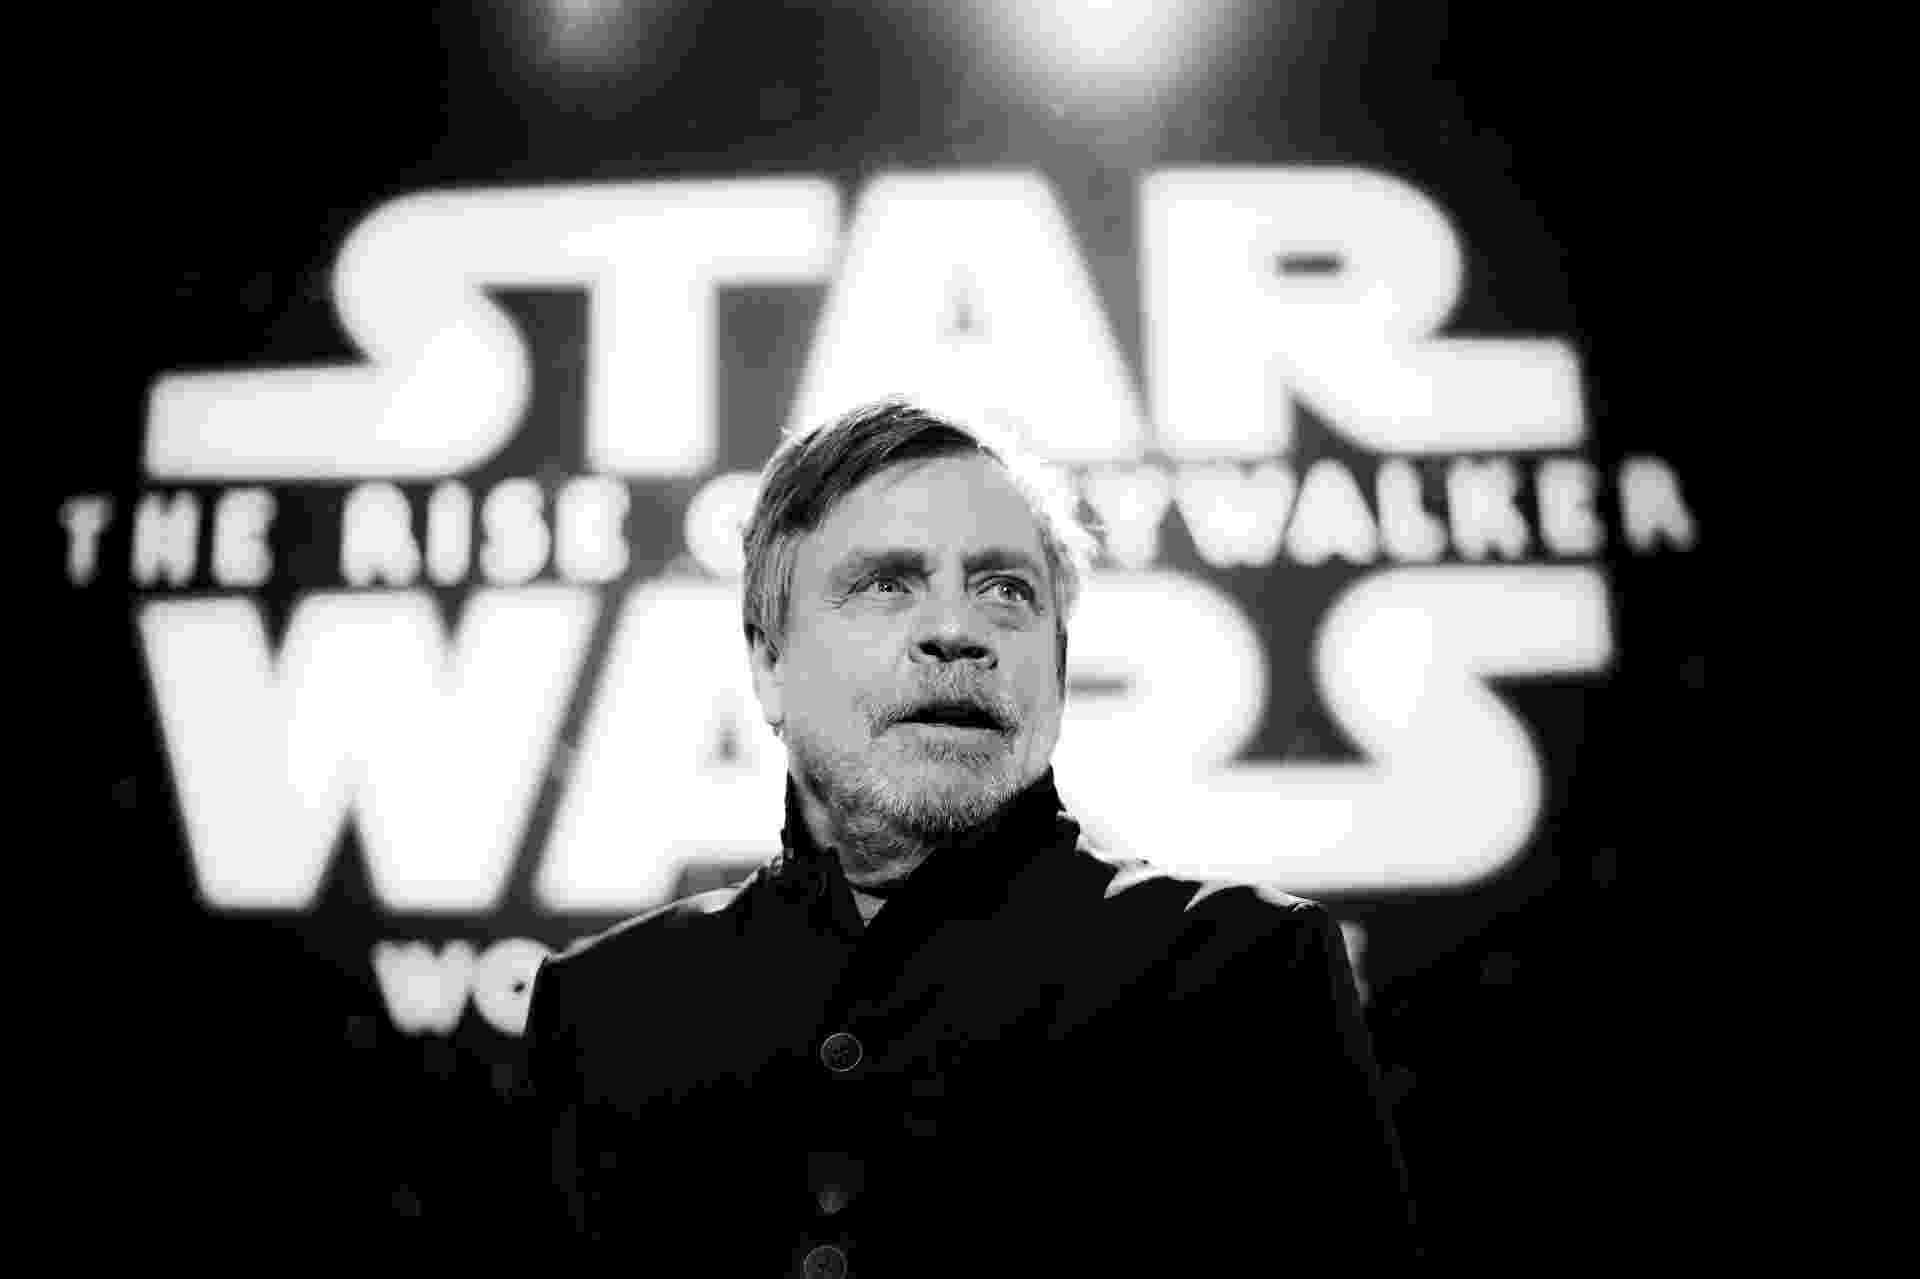 Mark Hamill, o Luke Skywalker, chega para estreia de Star Wars: A Ascensão Skywalker - RICH FURY / GETTY IMAGES NORTH AMERICA / AFP